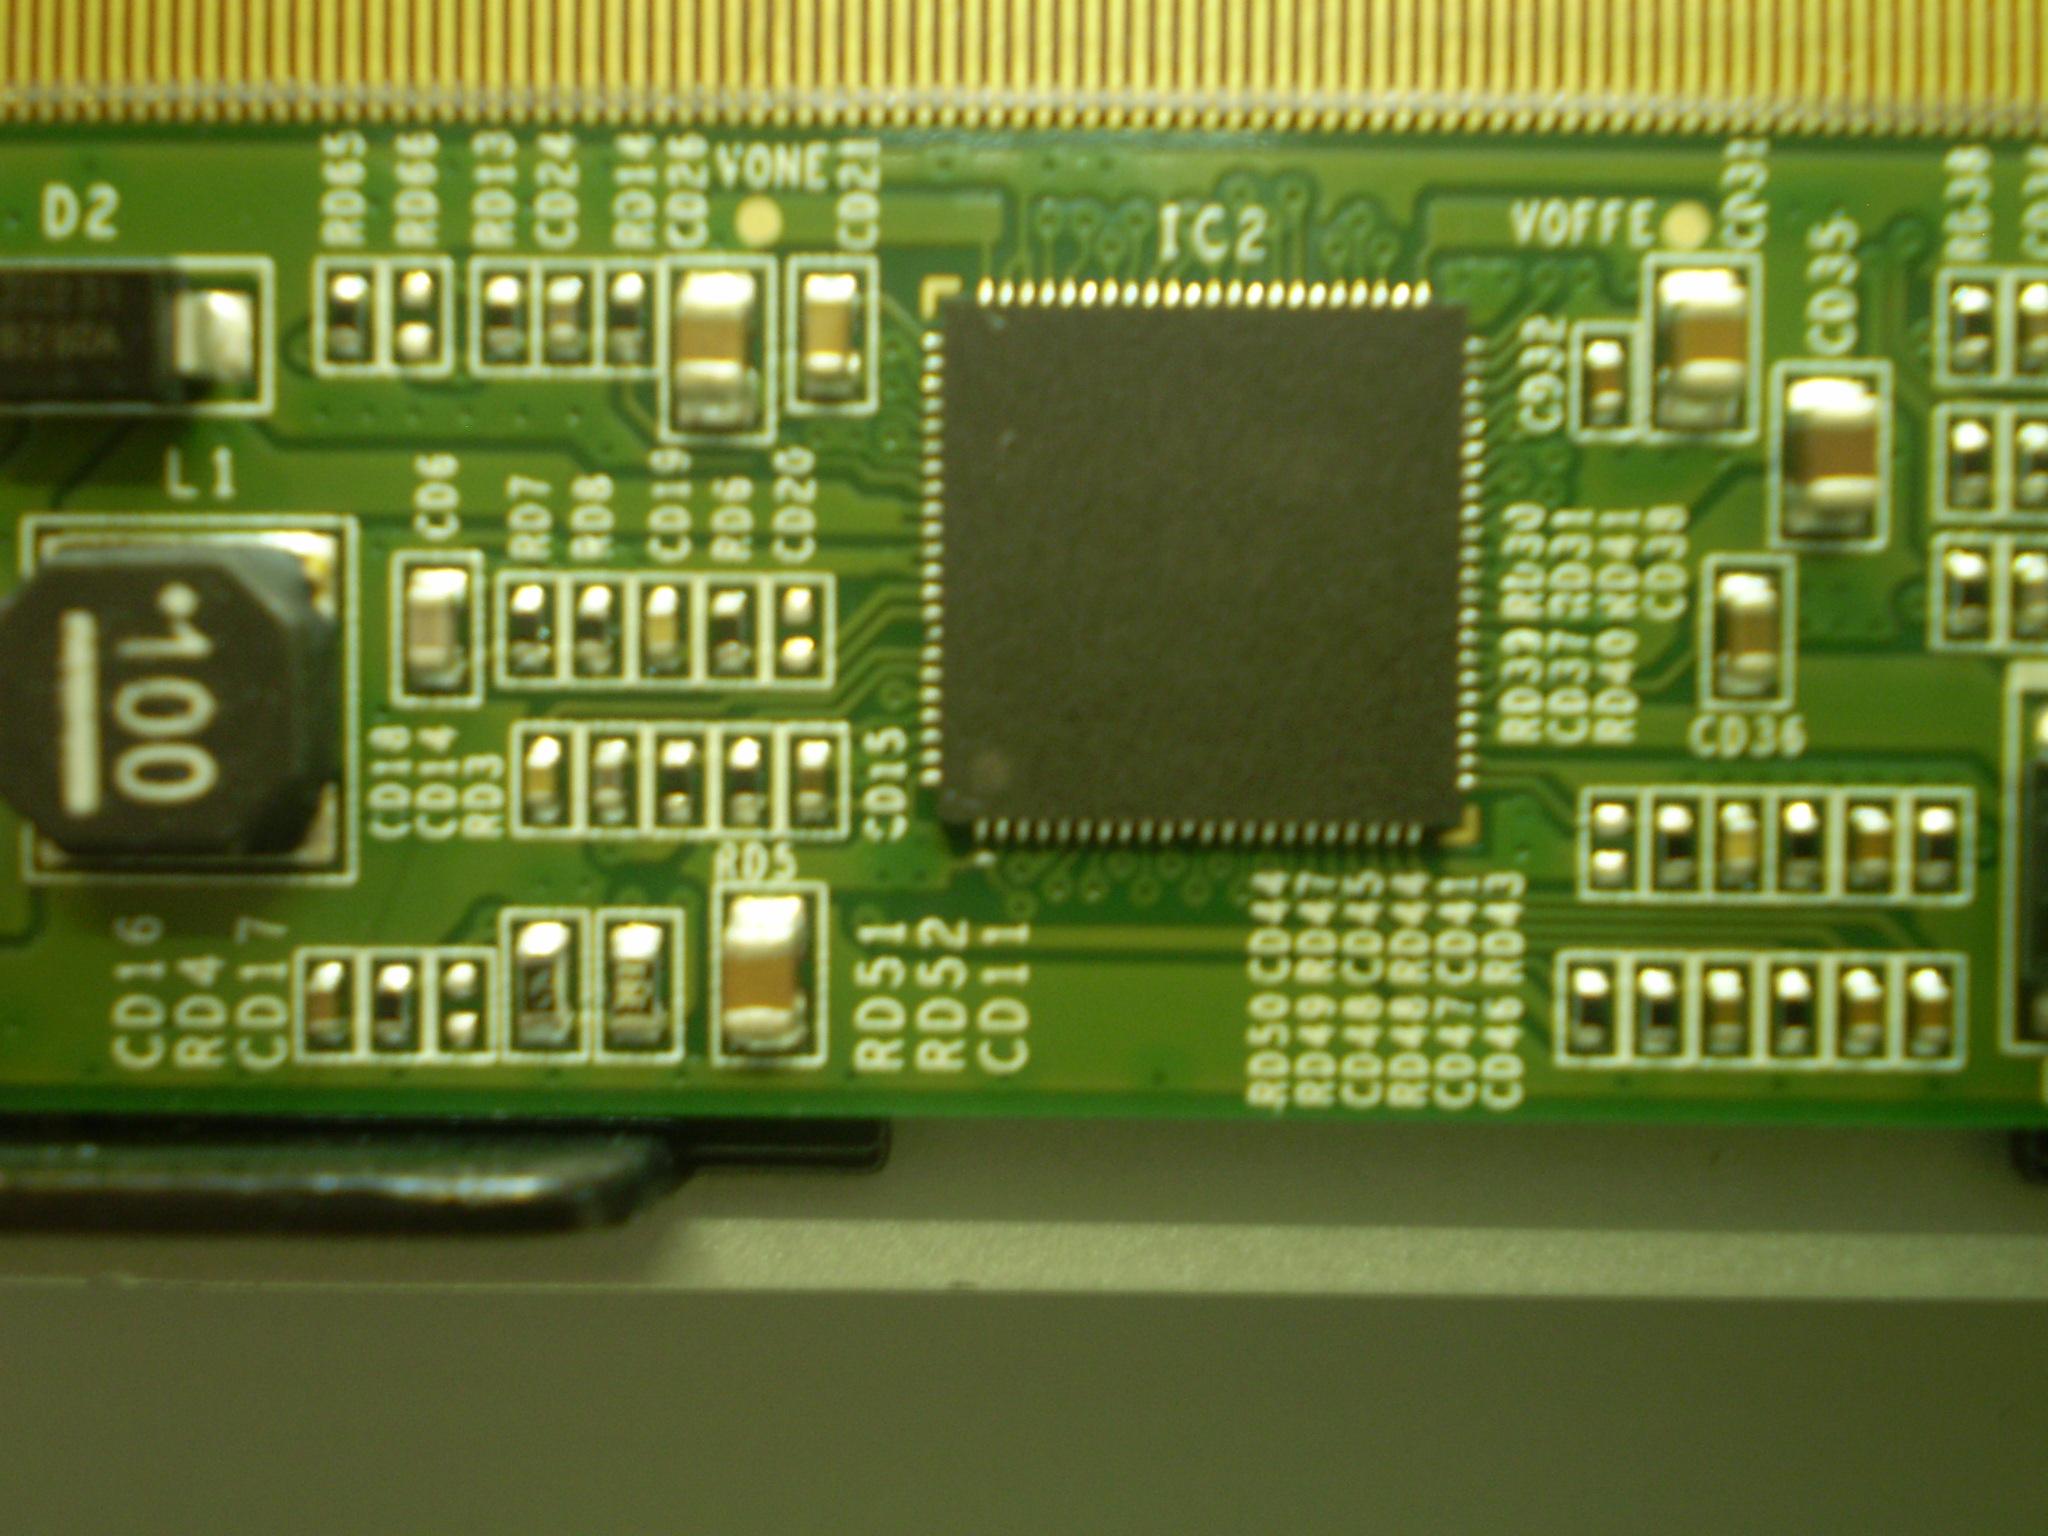 Samsung LE32E420E2W - Brak obrazu,  delikatnie miga, fonia obecna